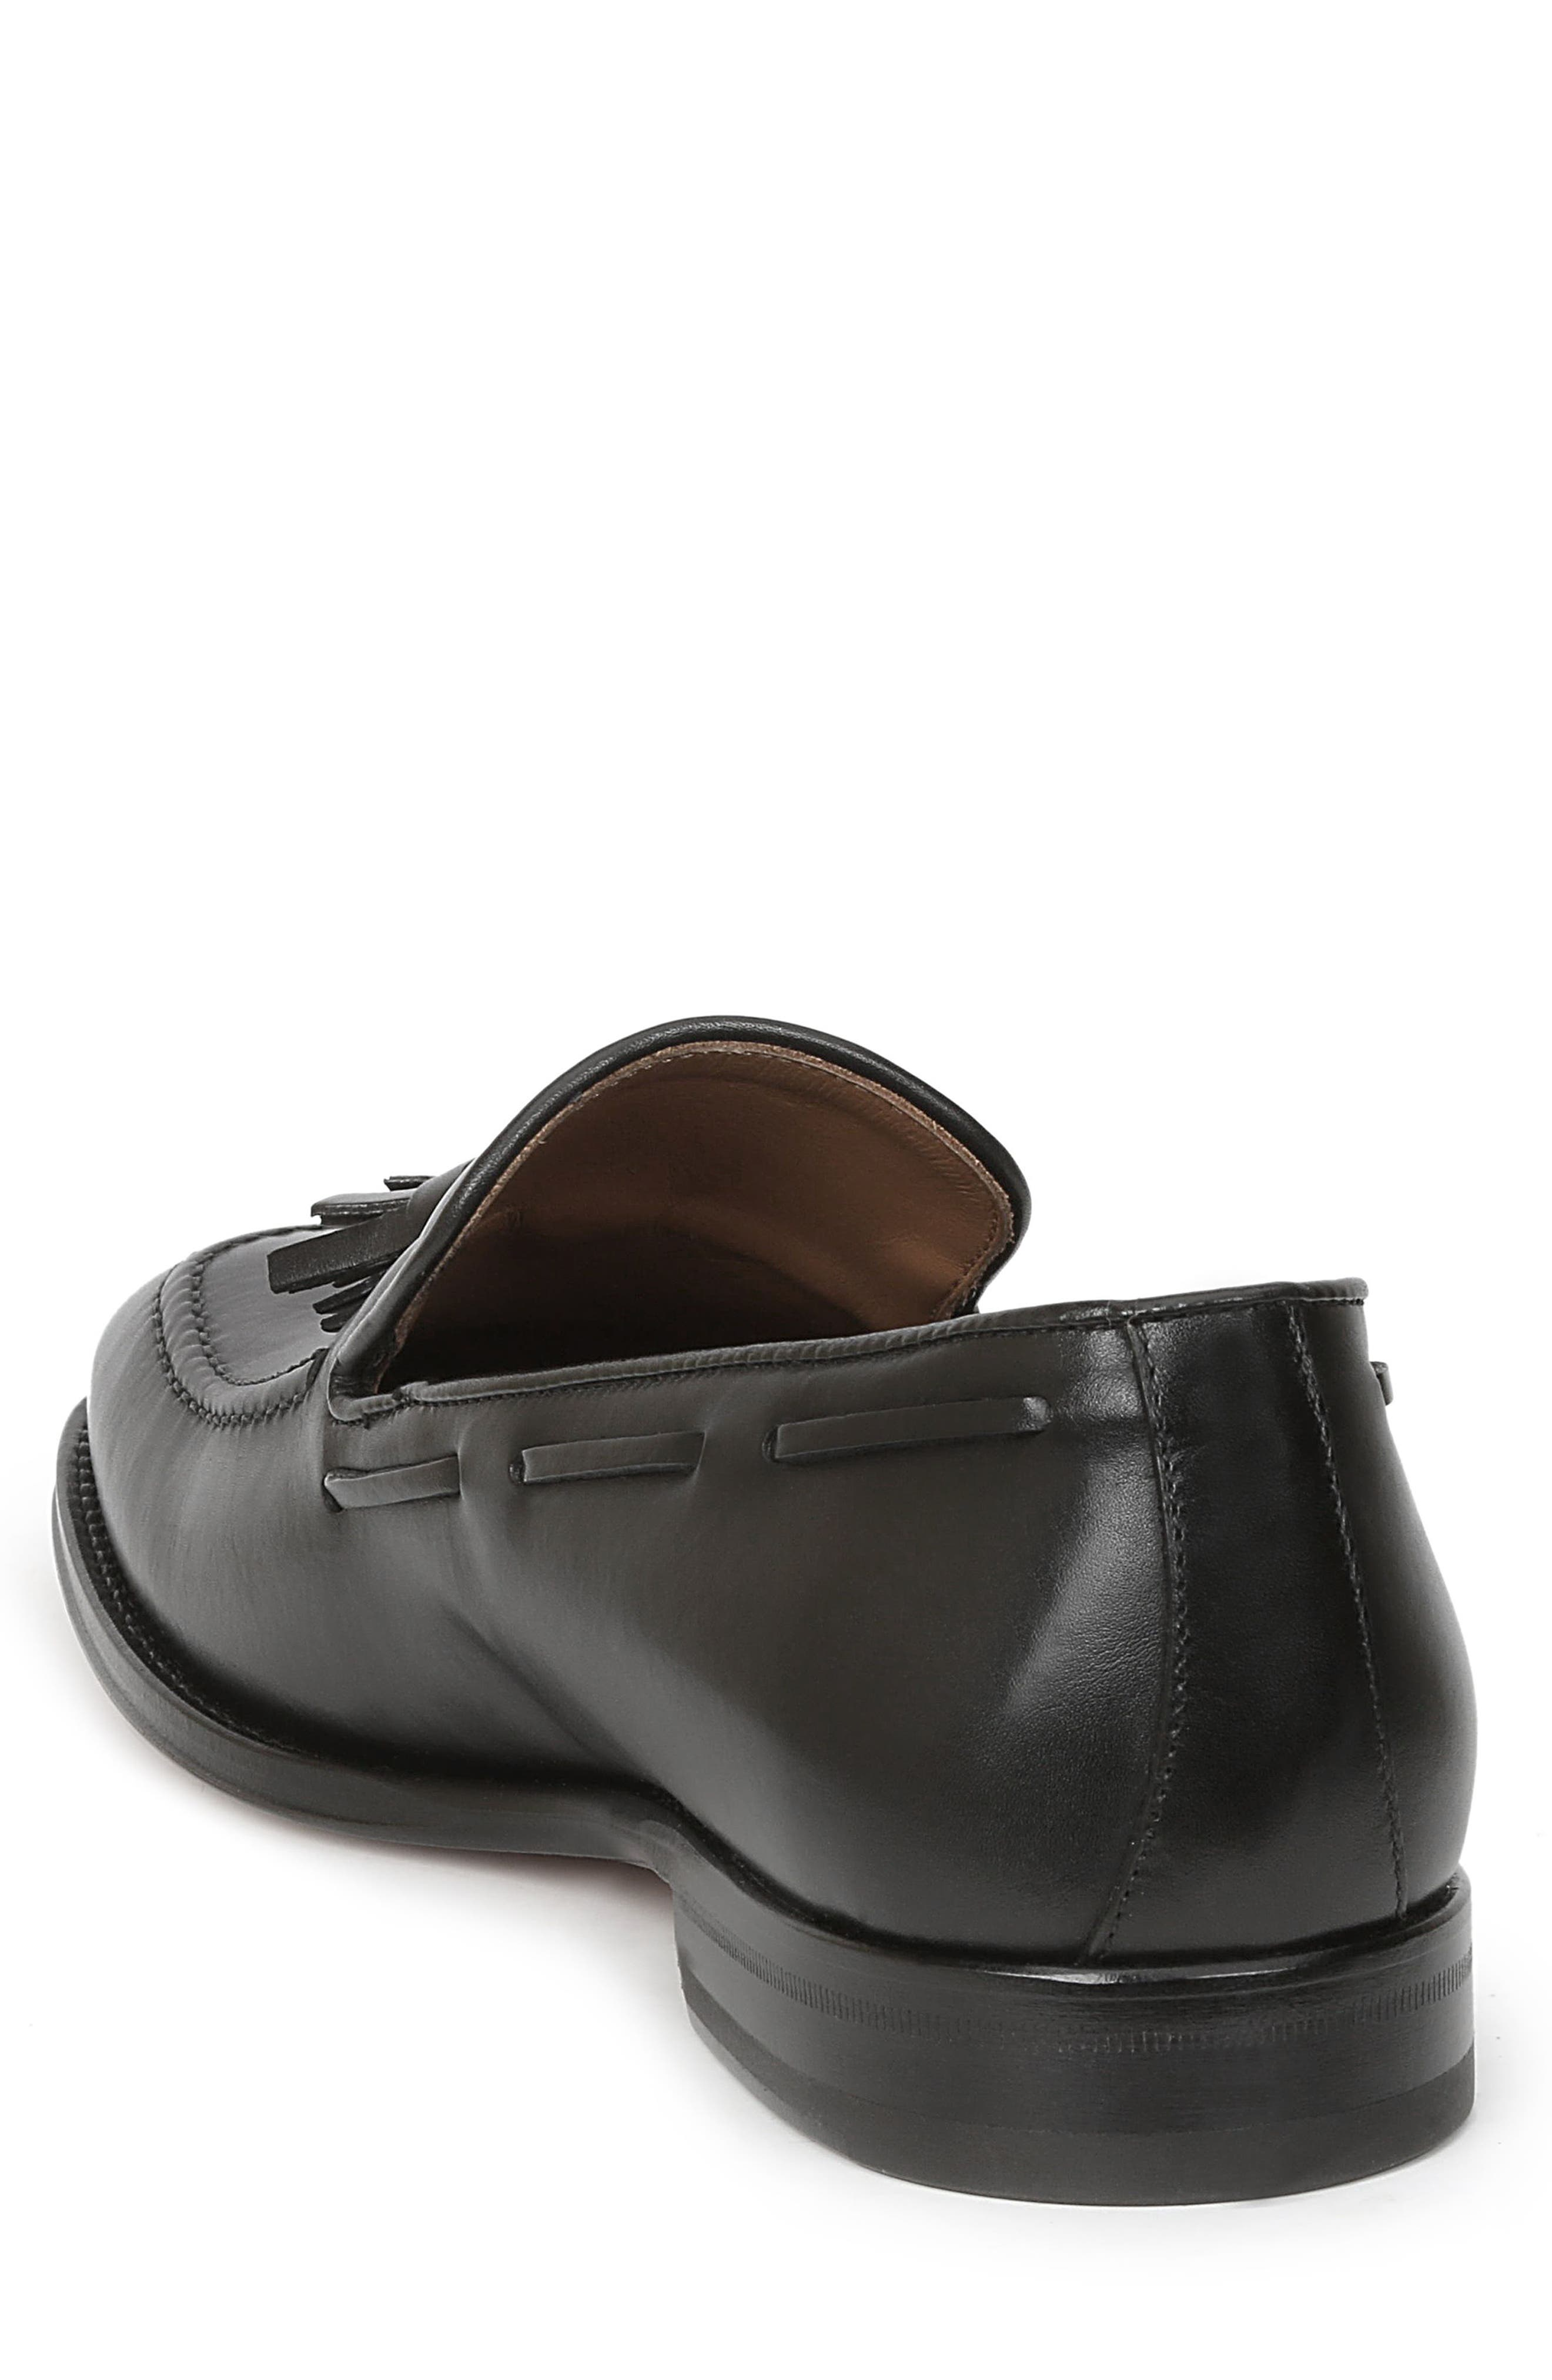 Fabiolo Tasseled Apron Toe Loafer,                             Alternate thumbnail 2, color,                             BLACK